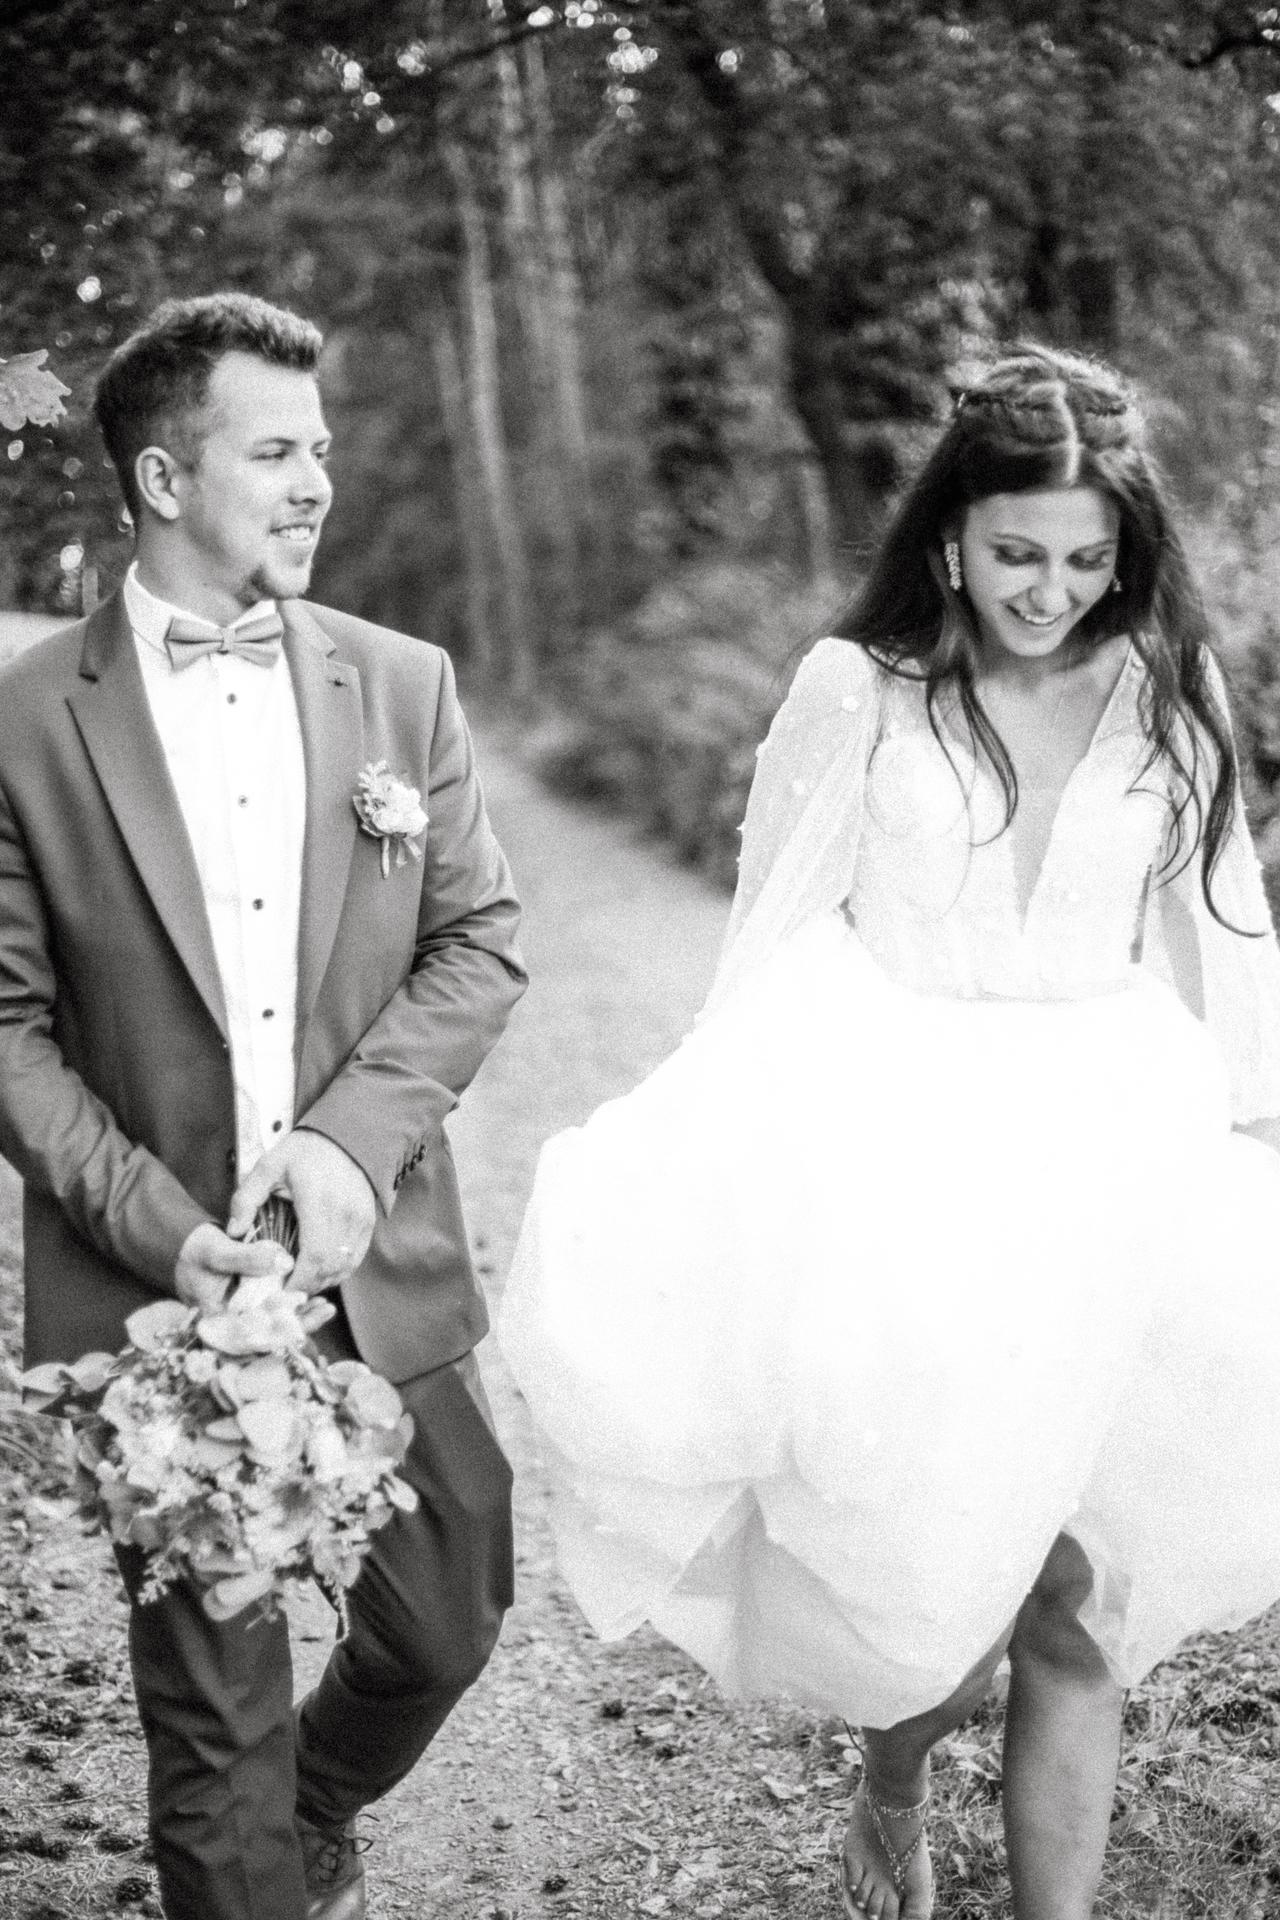 Naše svatba - Obrázek č. 7